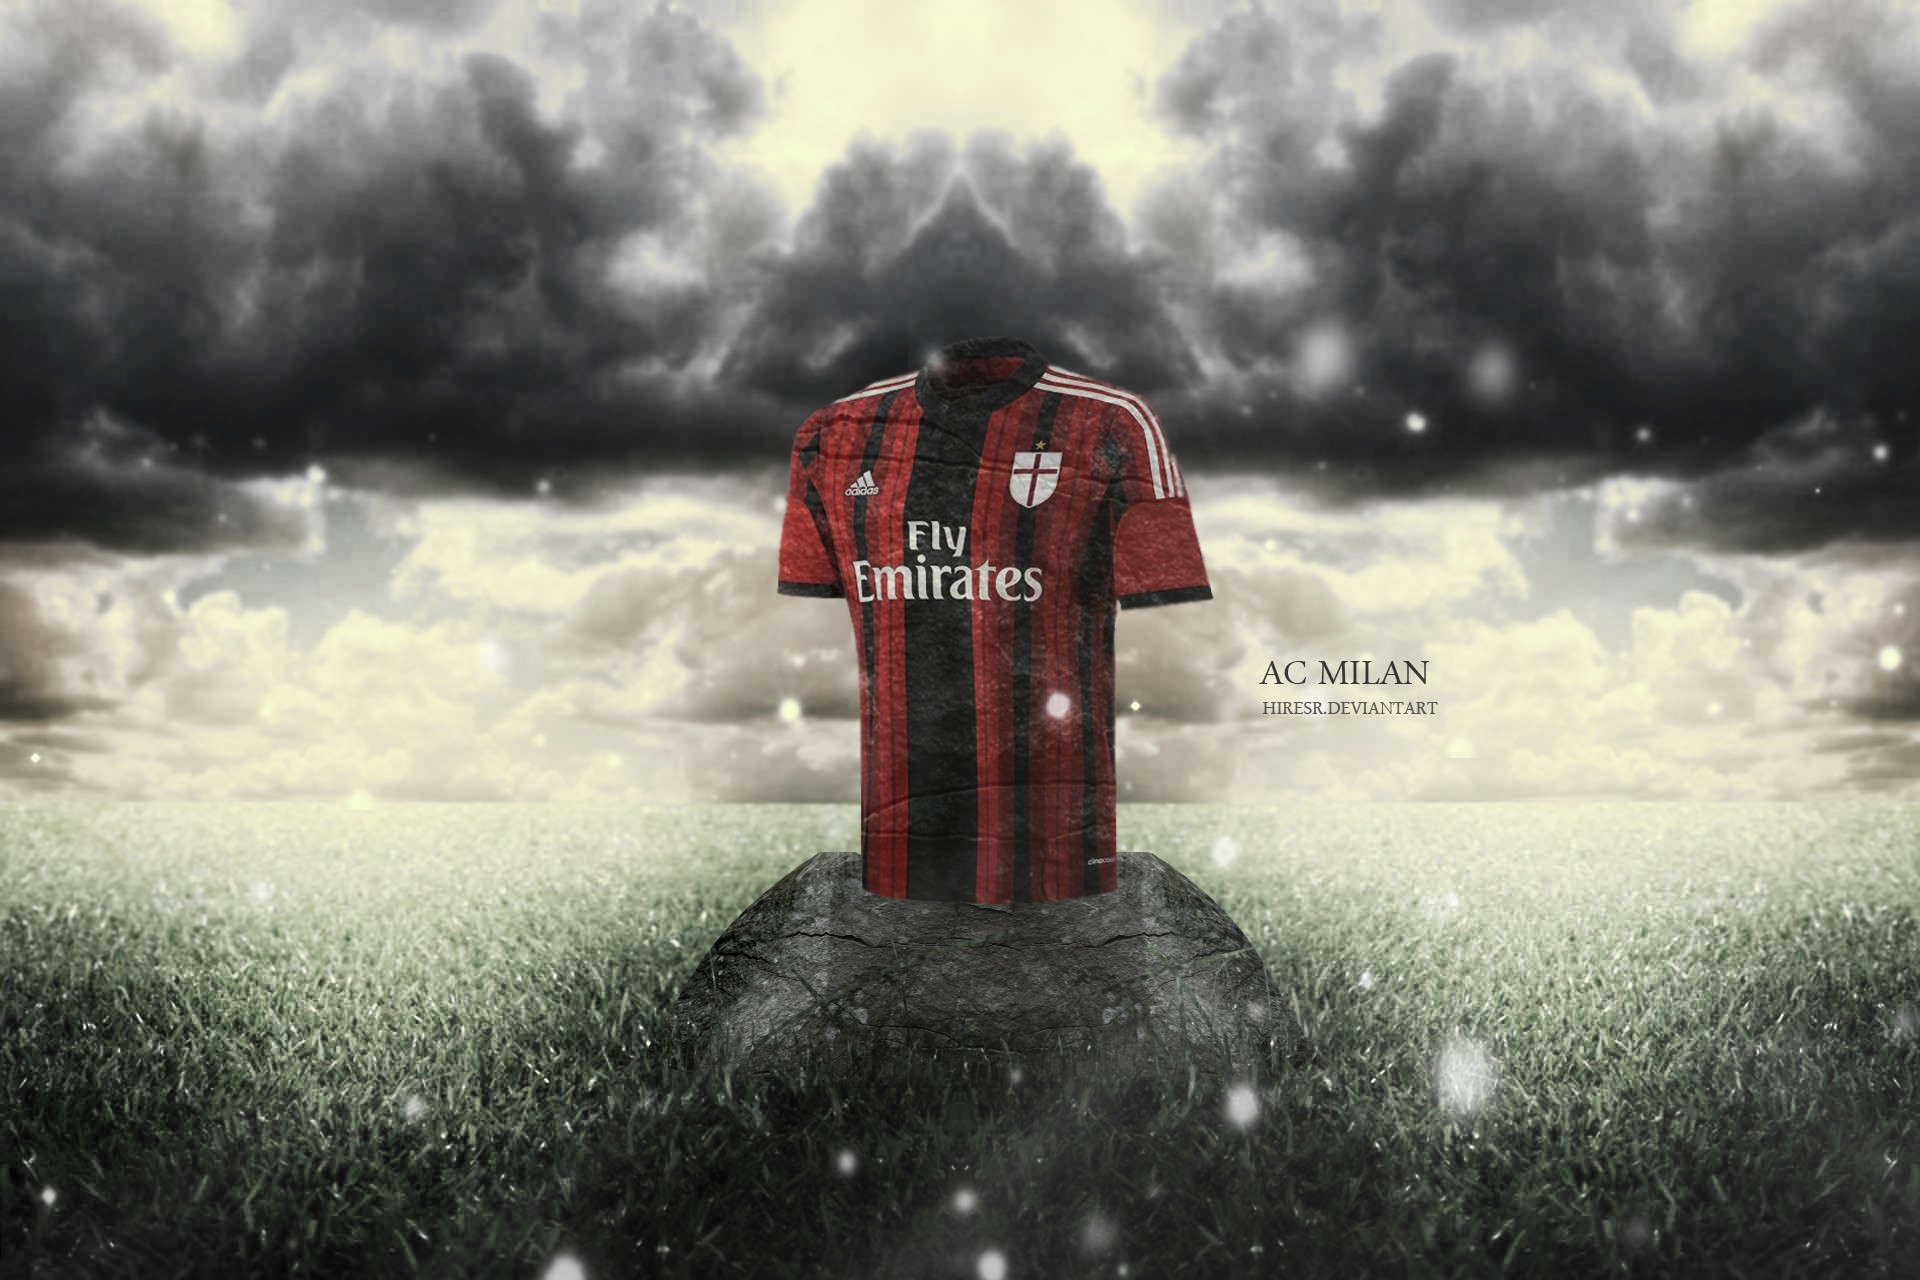 General 1920x1280 DeviantArt AC Milan sport  soccer